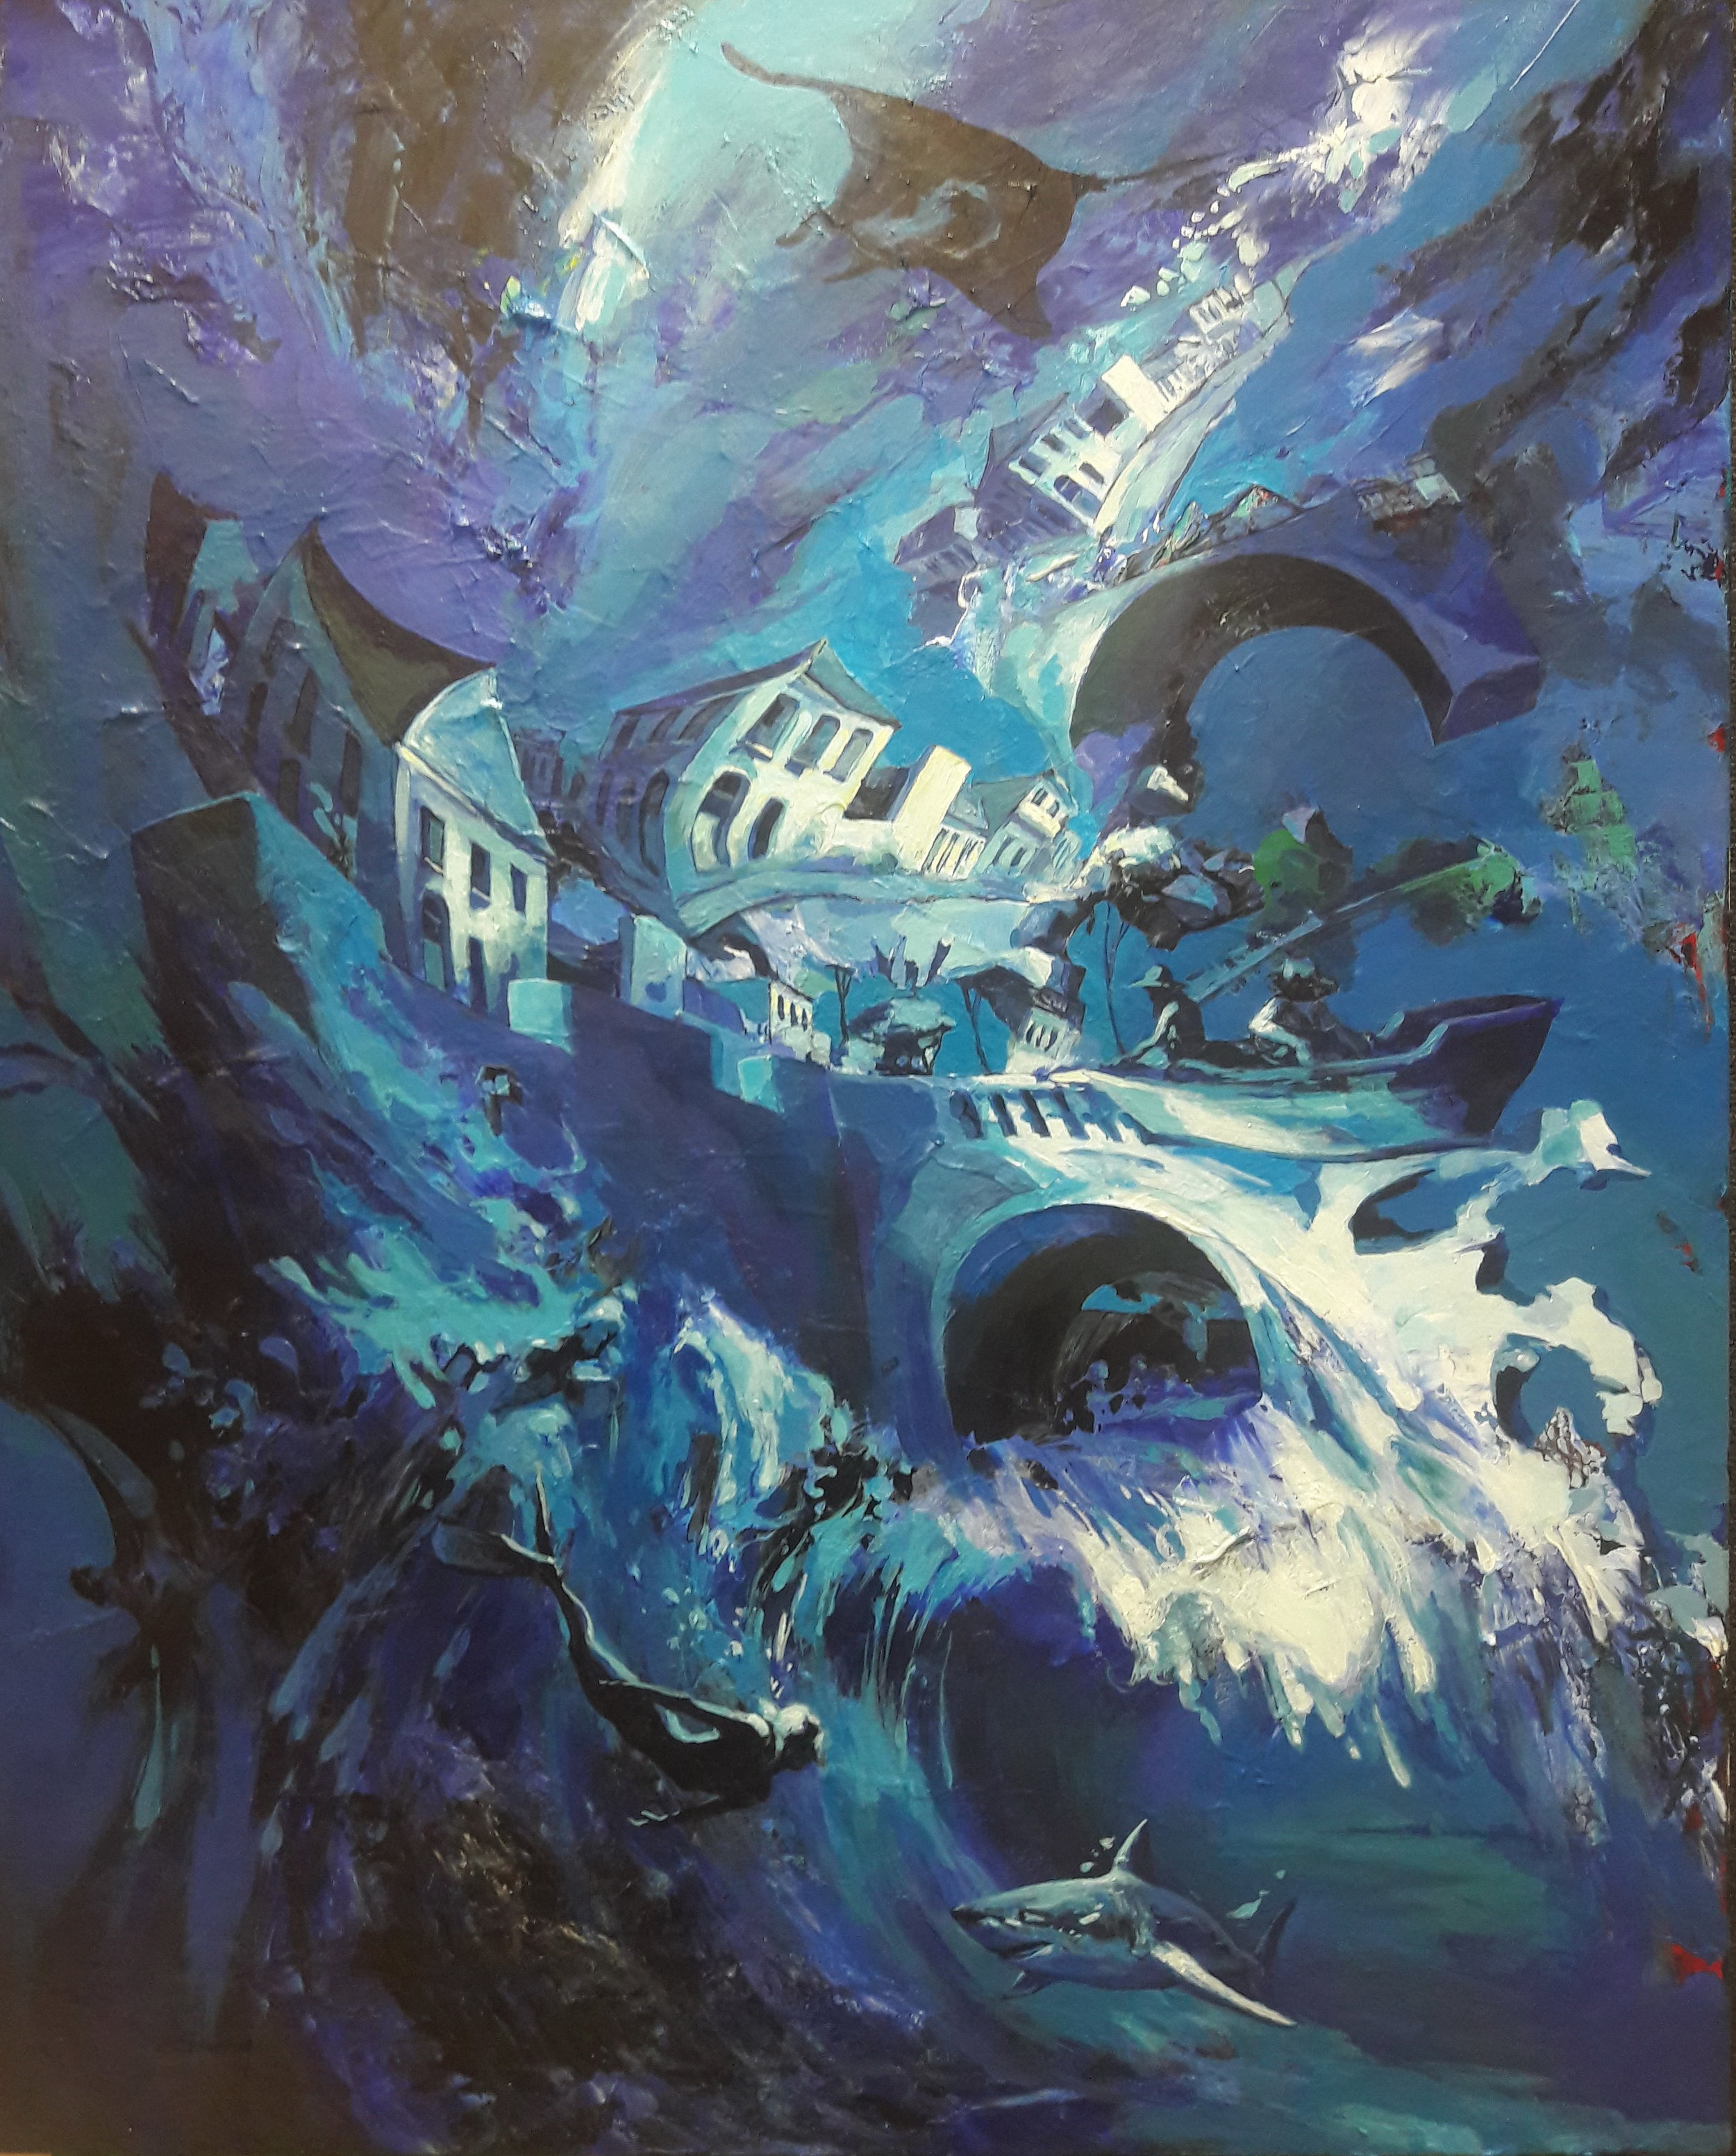 20496922-Osmar Reyes_Into the Storm_Acrylic  Canvas_30 x 24_Junio 2019.jpg